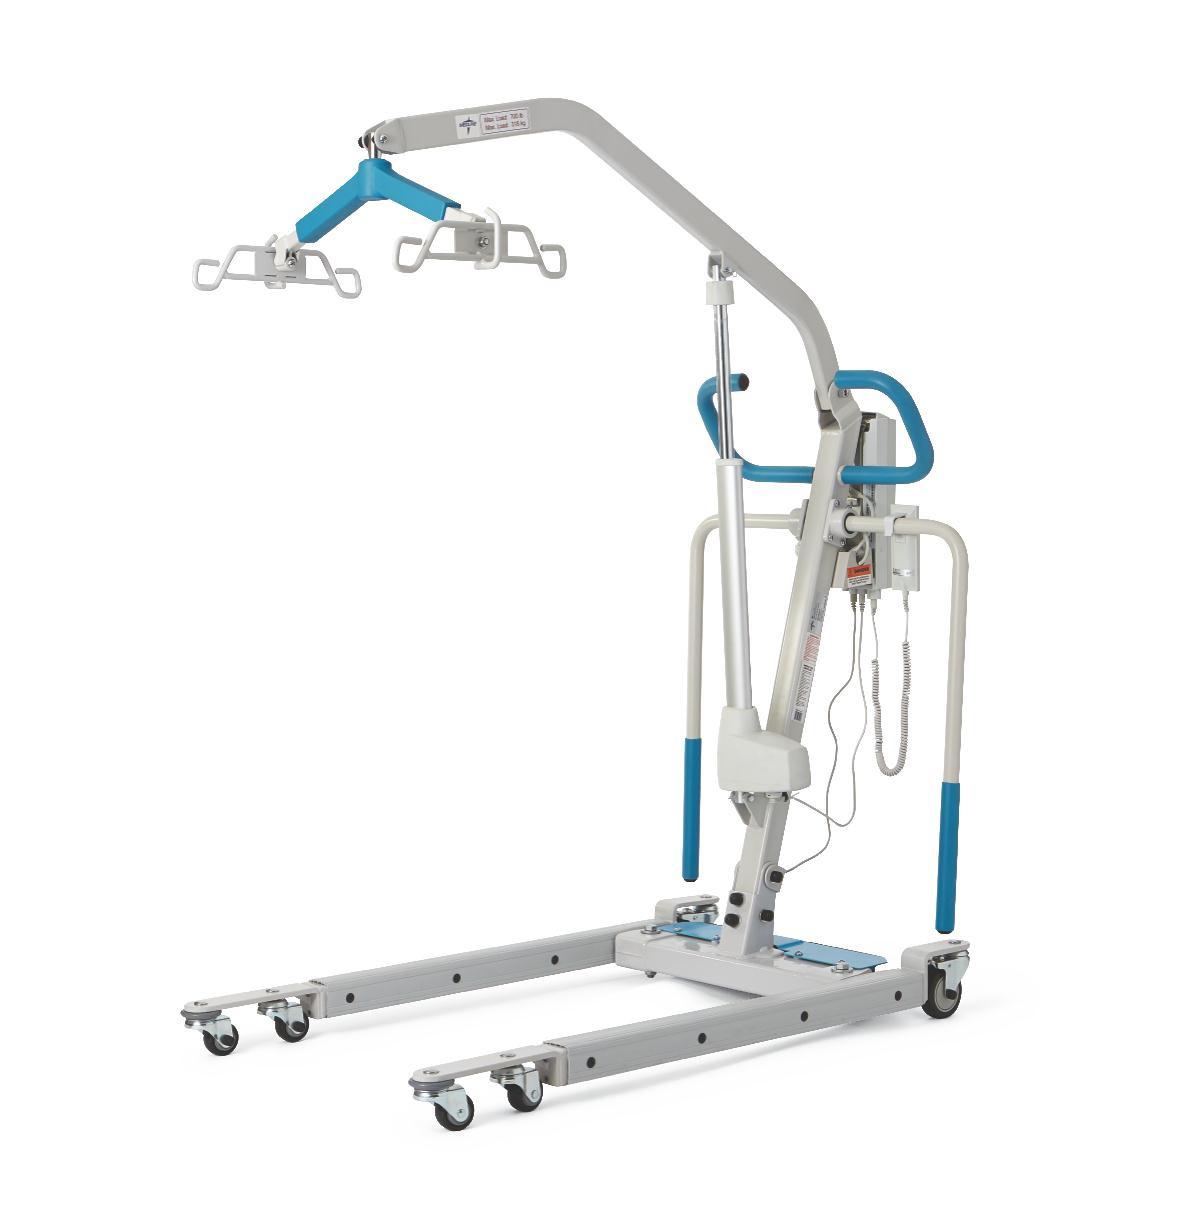 Medline MDS700EL Full Body Bariatric Electric Patient Lift